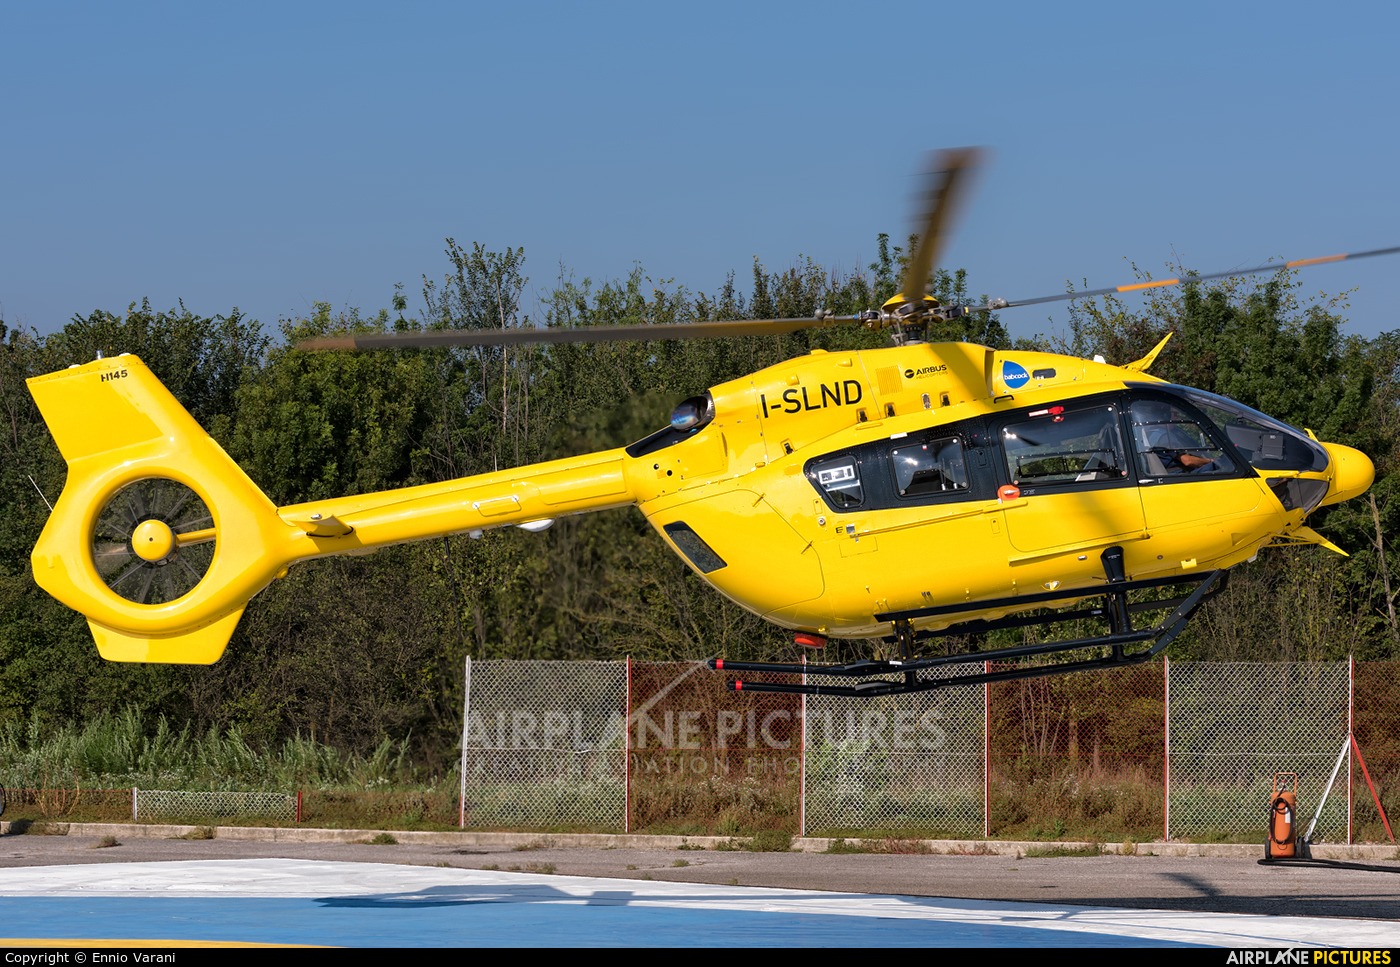 Babcok M.C.S Italia I-SLND aircraft at Off Airport - Italy